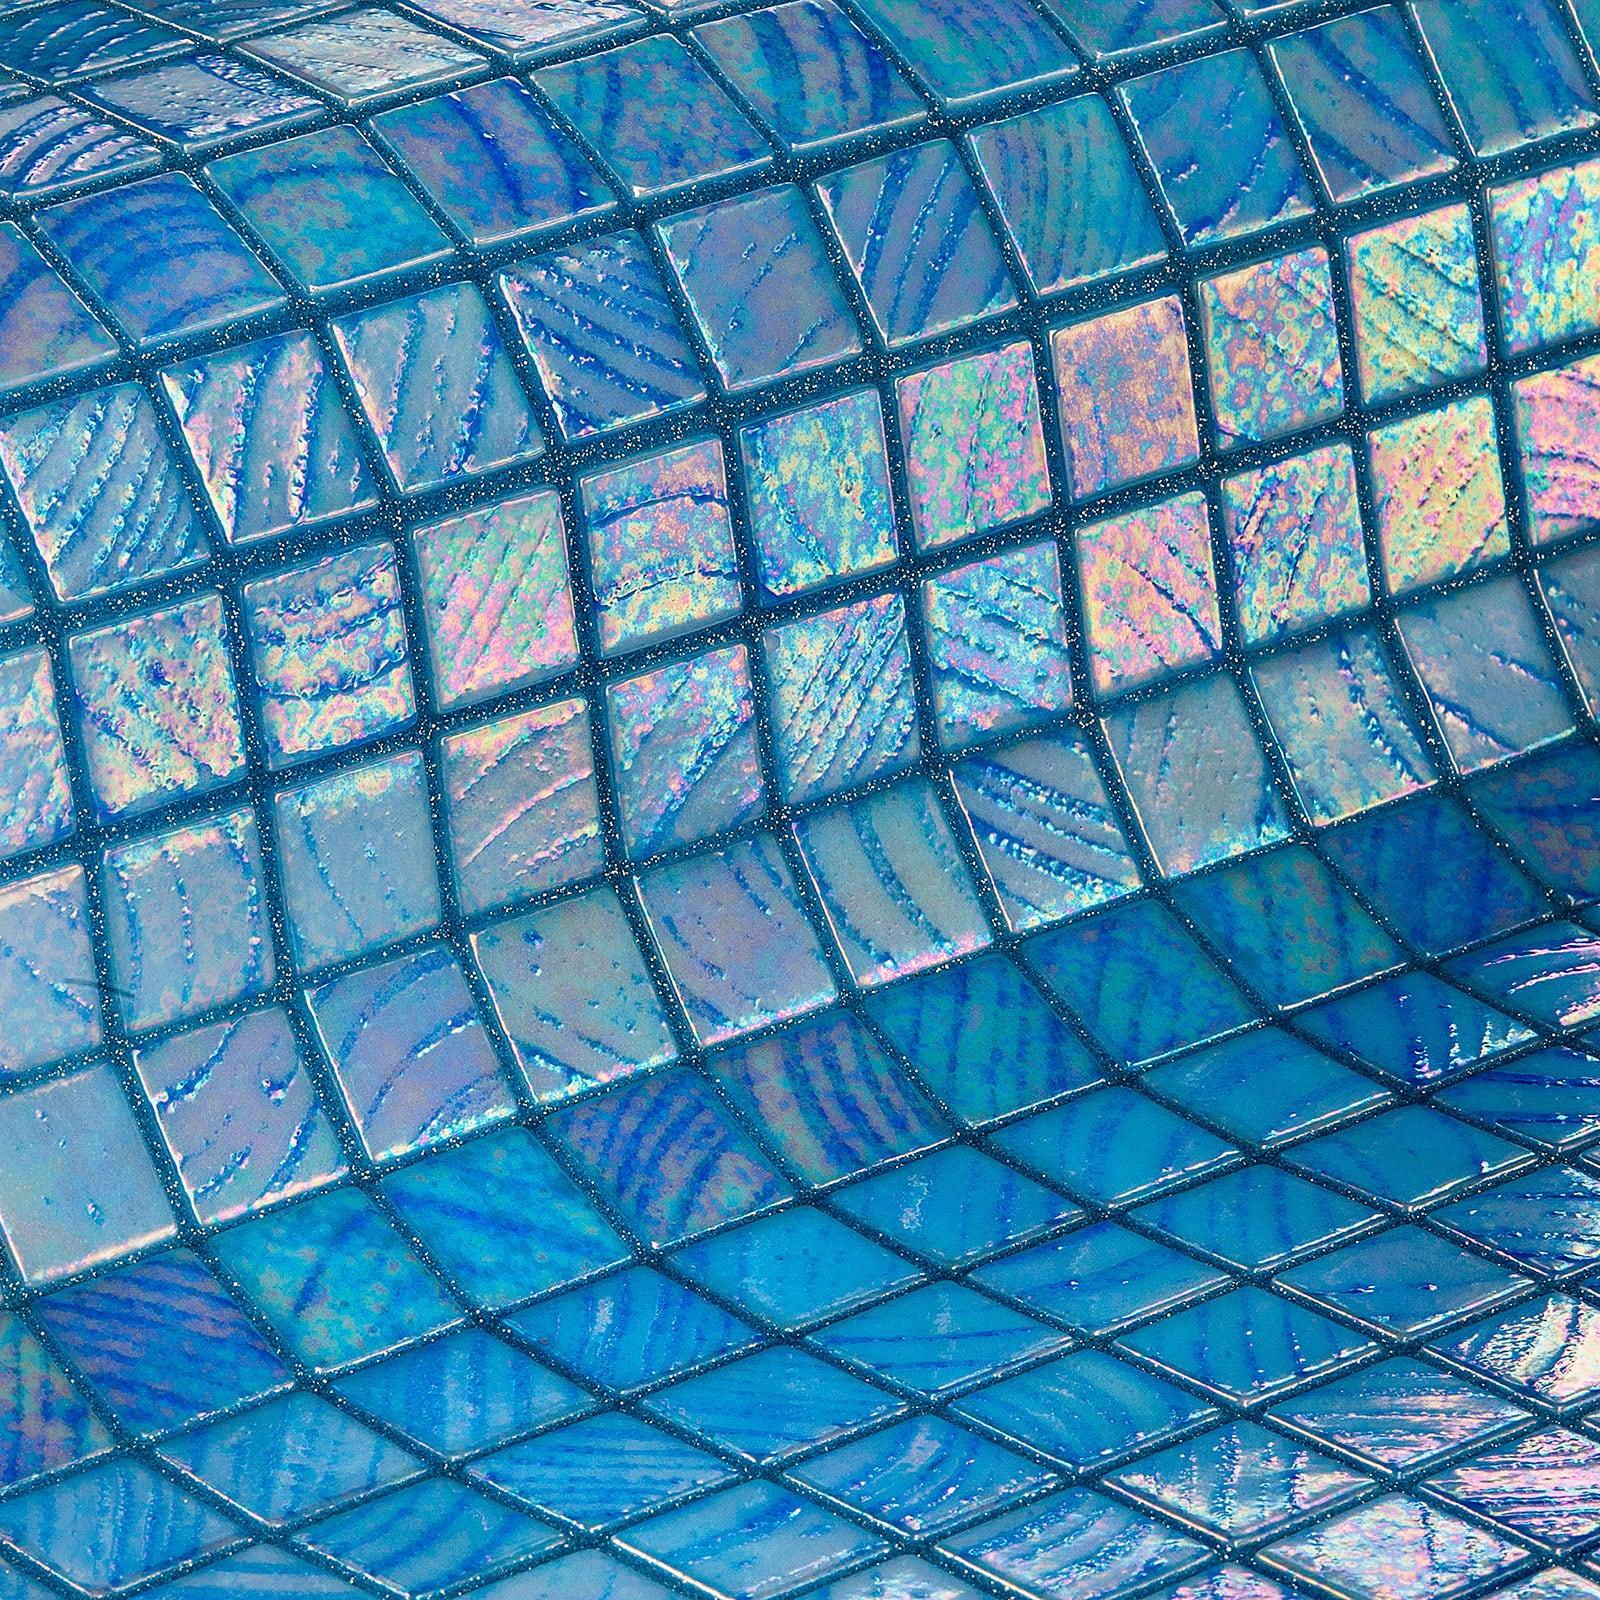 Stromboli-Vulcano-Mosaic-Ezarri.jpg